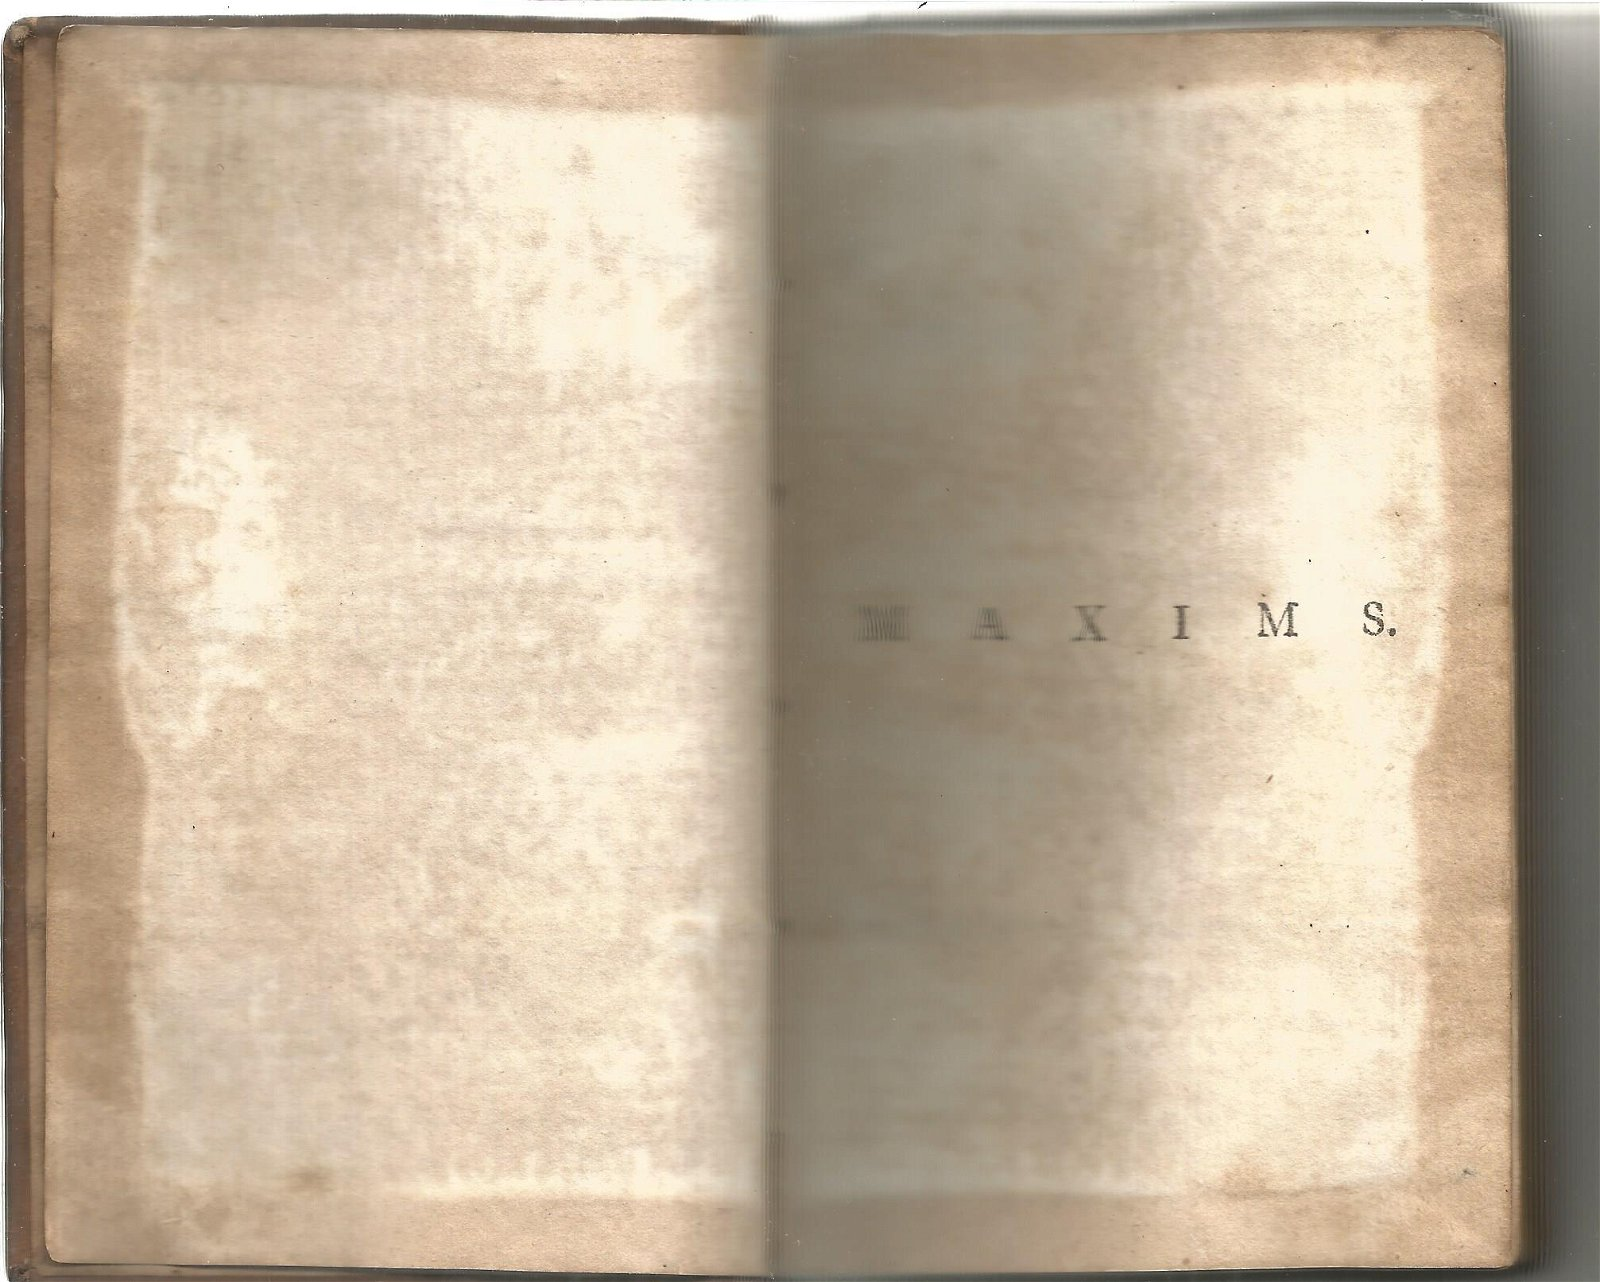 Maxims and Moral Reflections hardback book. 1776. Water